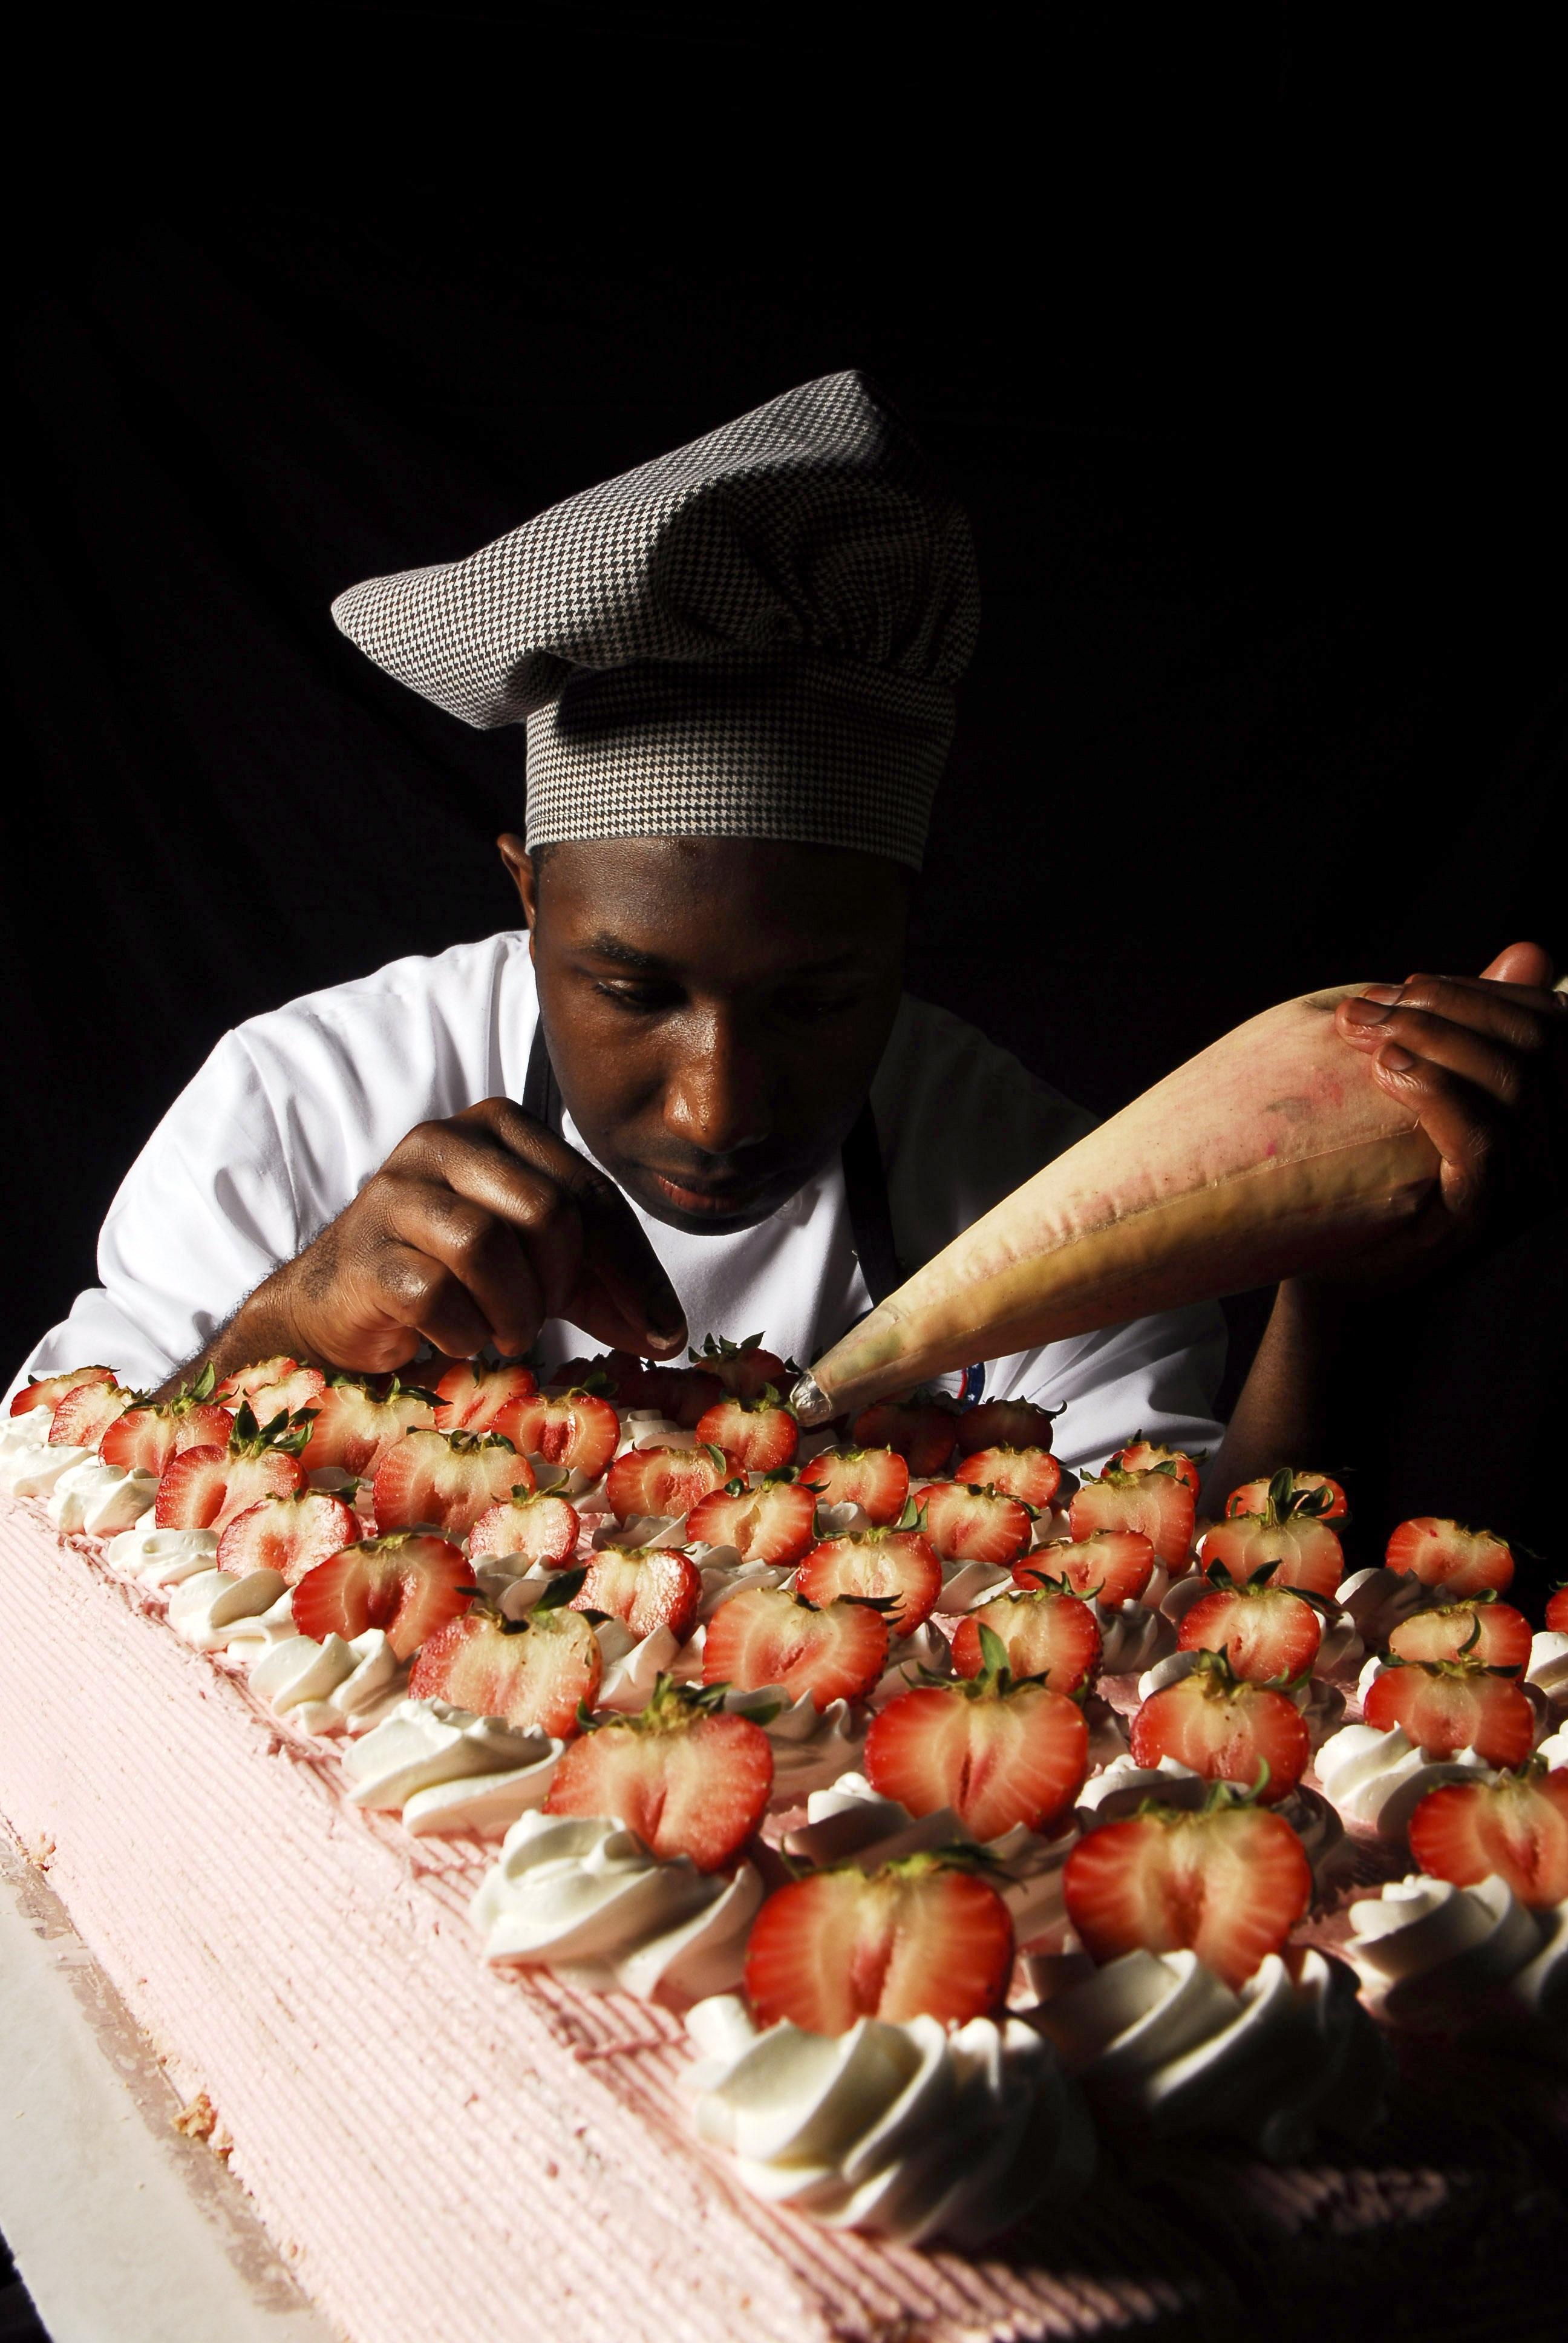 Gambar Manusia Pria Makanan Memasak Kuliner Menghasilkan Tas